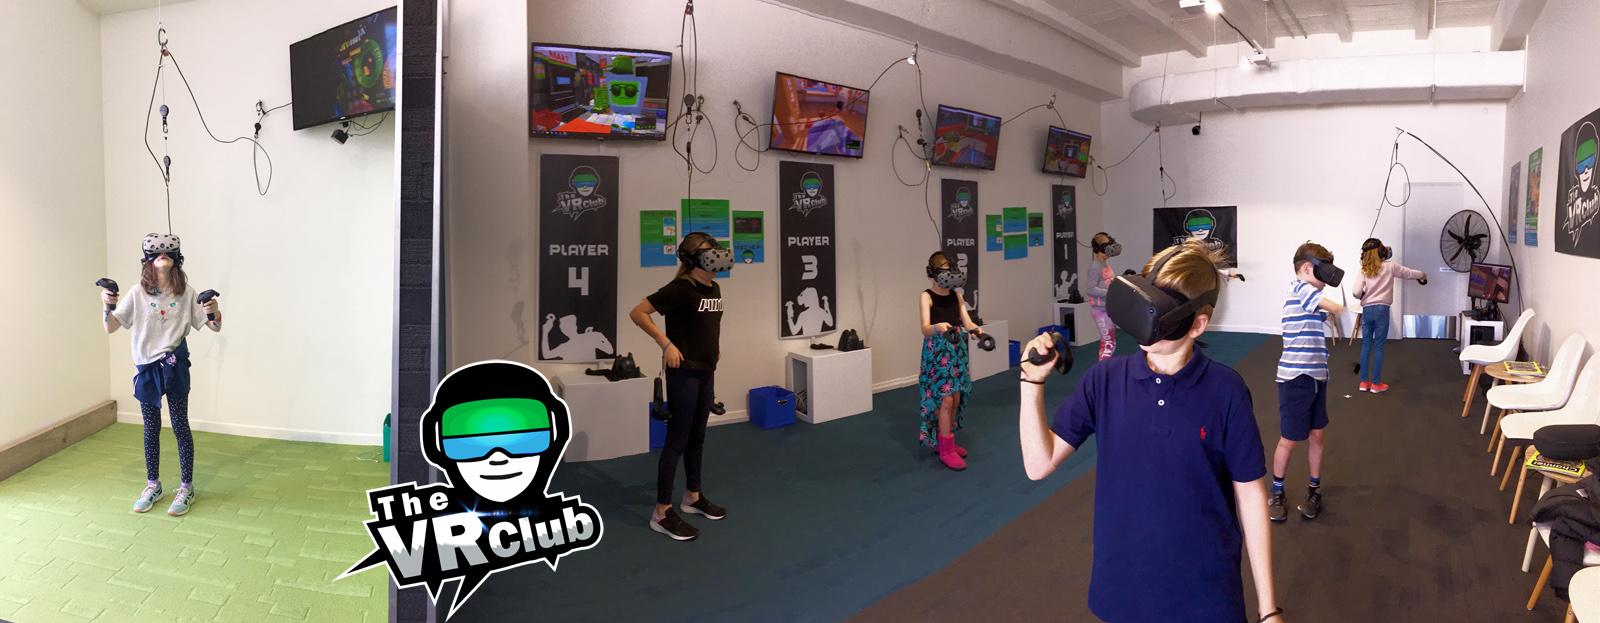 8playerphoto-withlogo.jpg